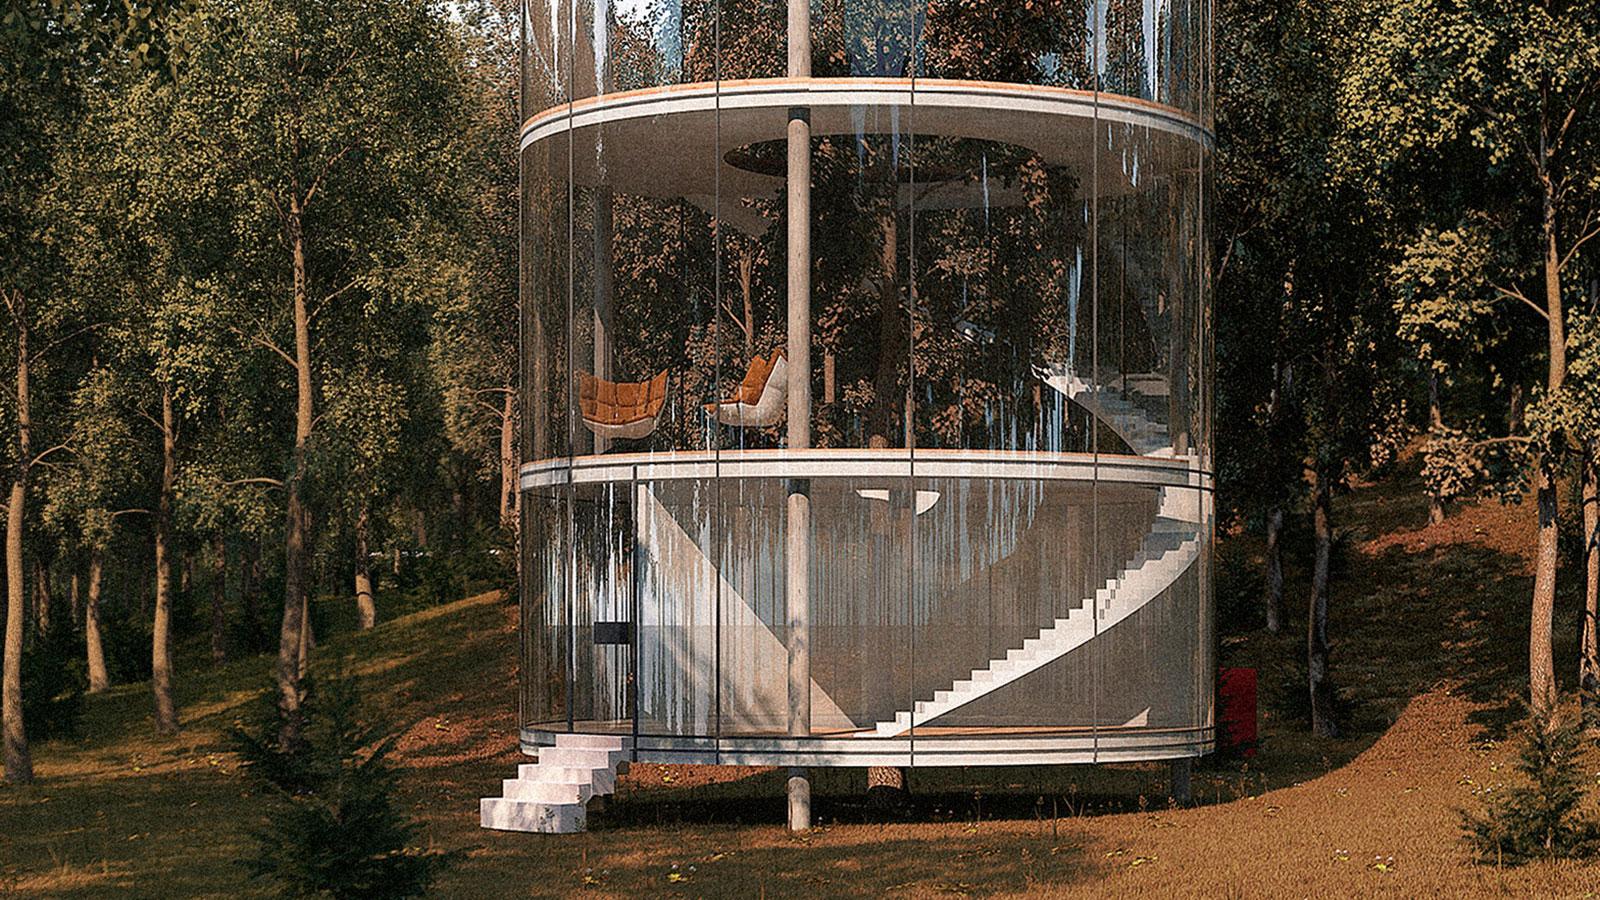 The-Tubular-Tree-House-By-Aibek-Almassov-2